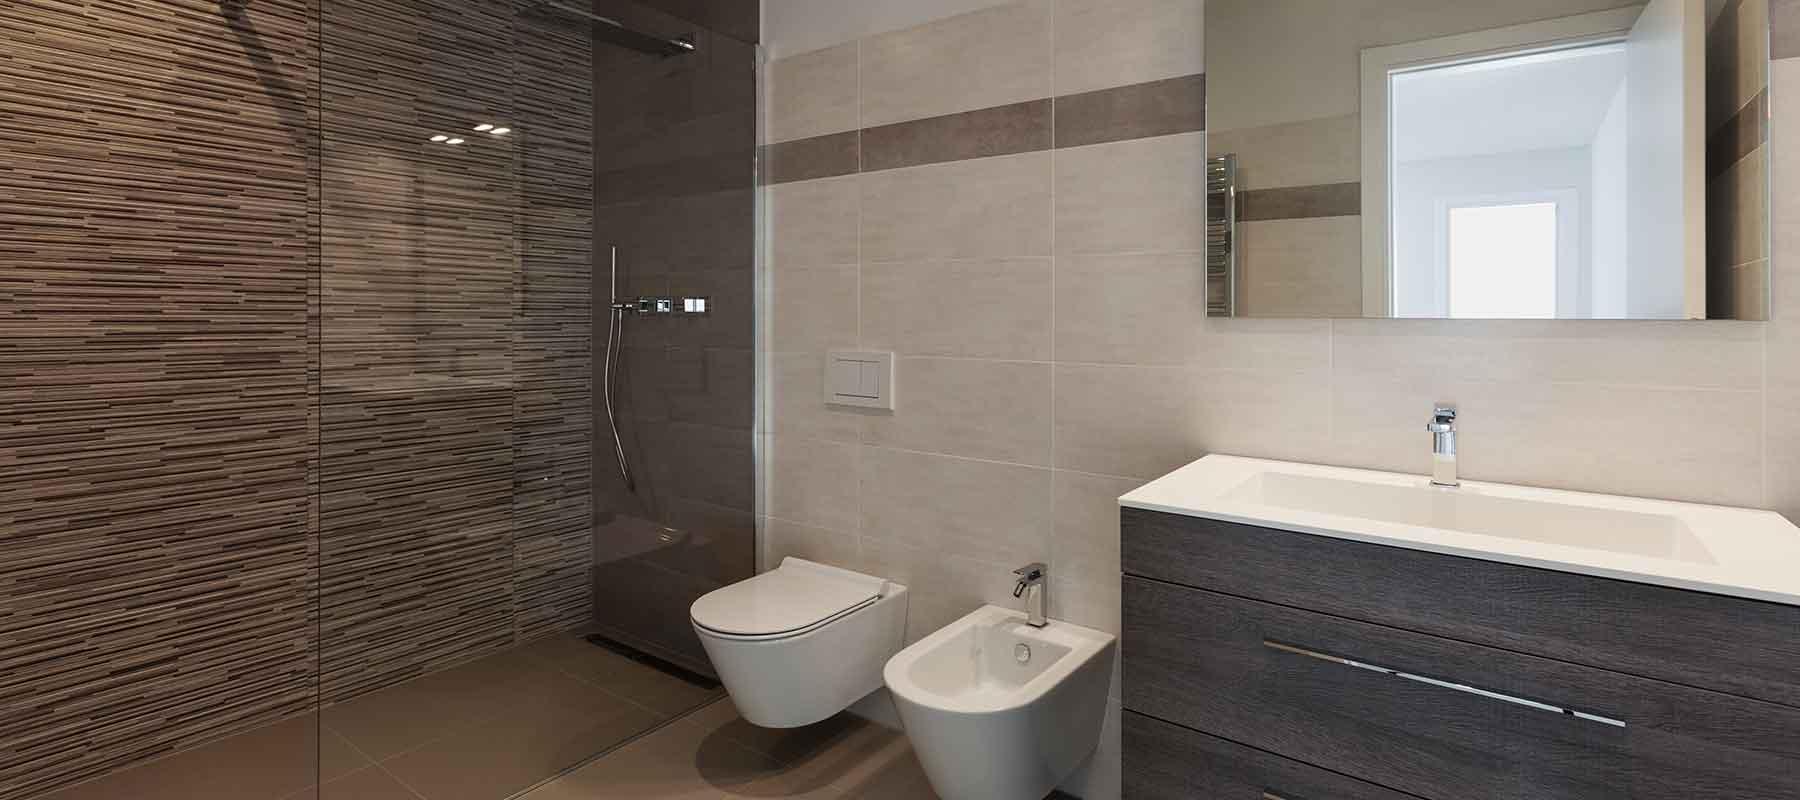 enth rtungsanlagen f r einfamilienh user alfiltra. Black Bedroom Furniture Sets. Home Design Ideas